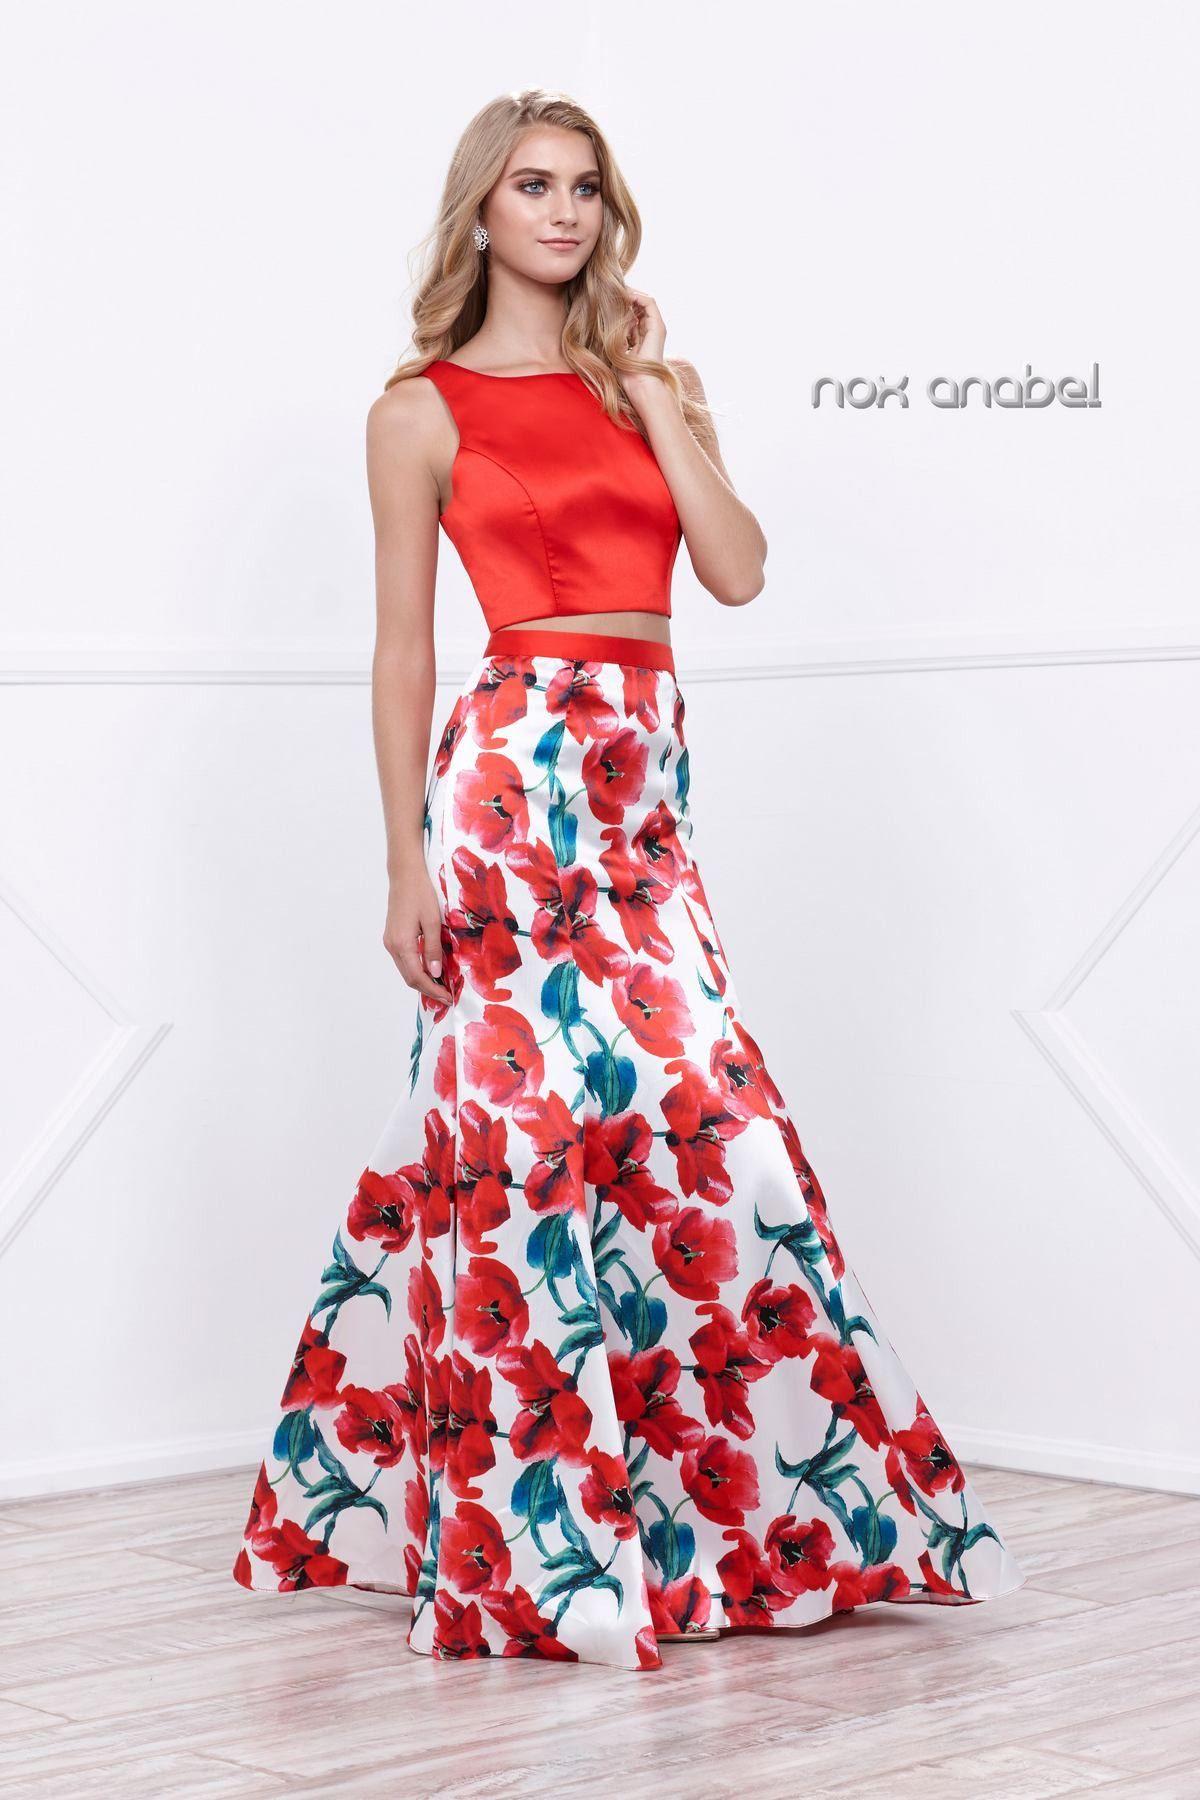 Red twopiece crop top floral print dress by nox anabel